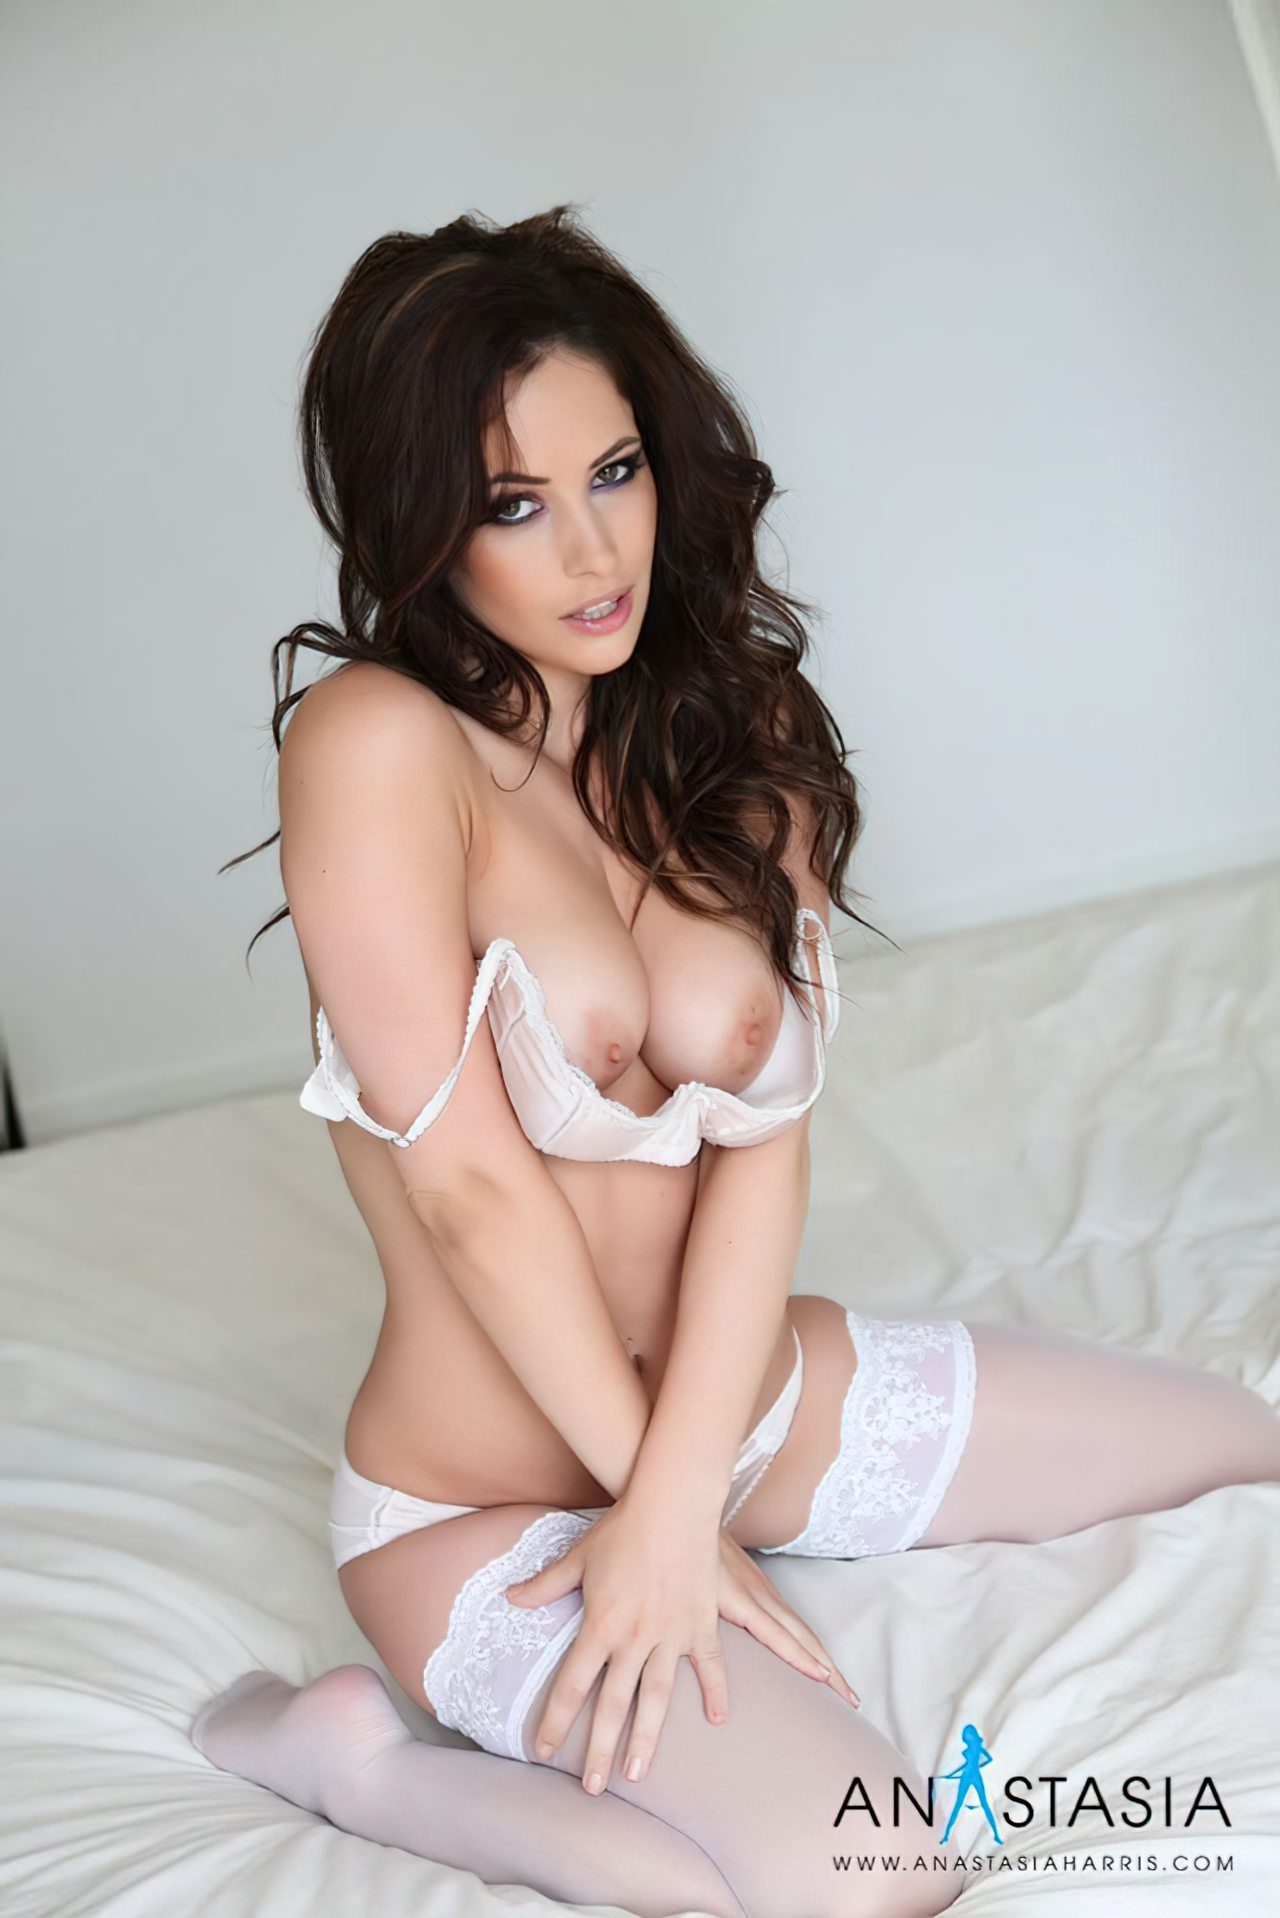 Anastasia Harris (28)